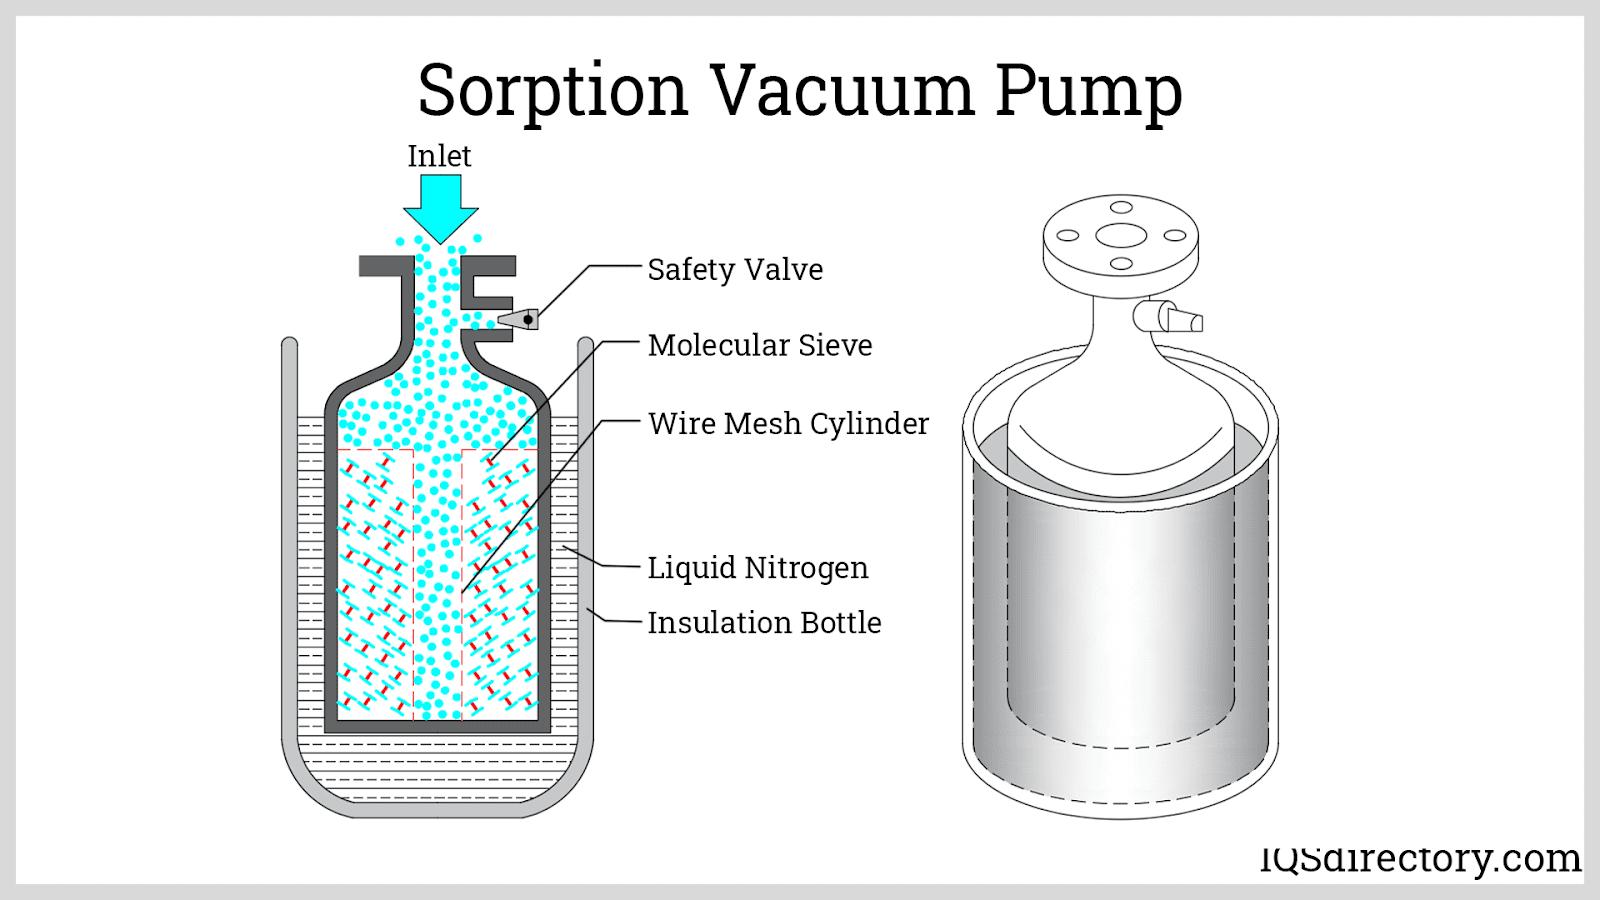 Sorption Vacuum Pump